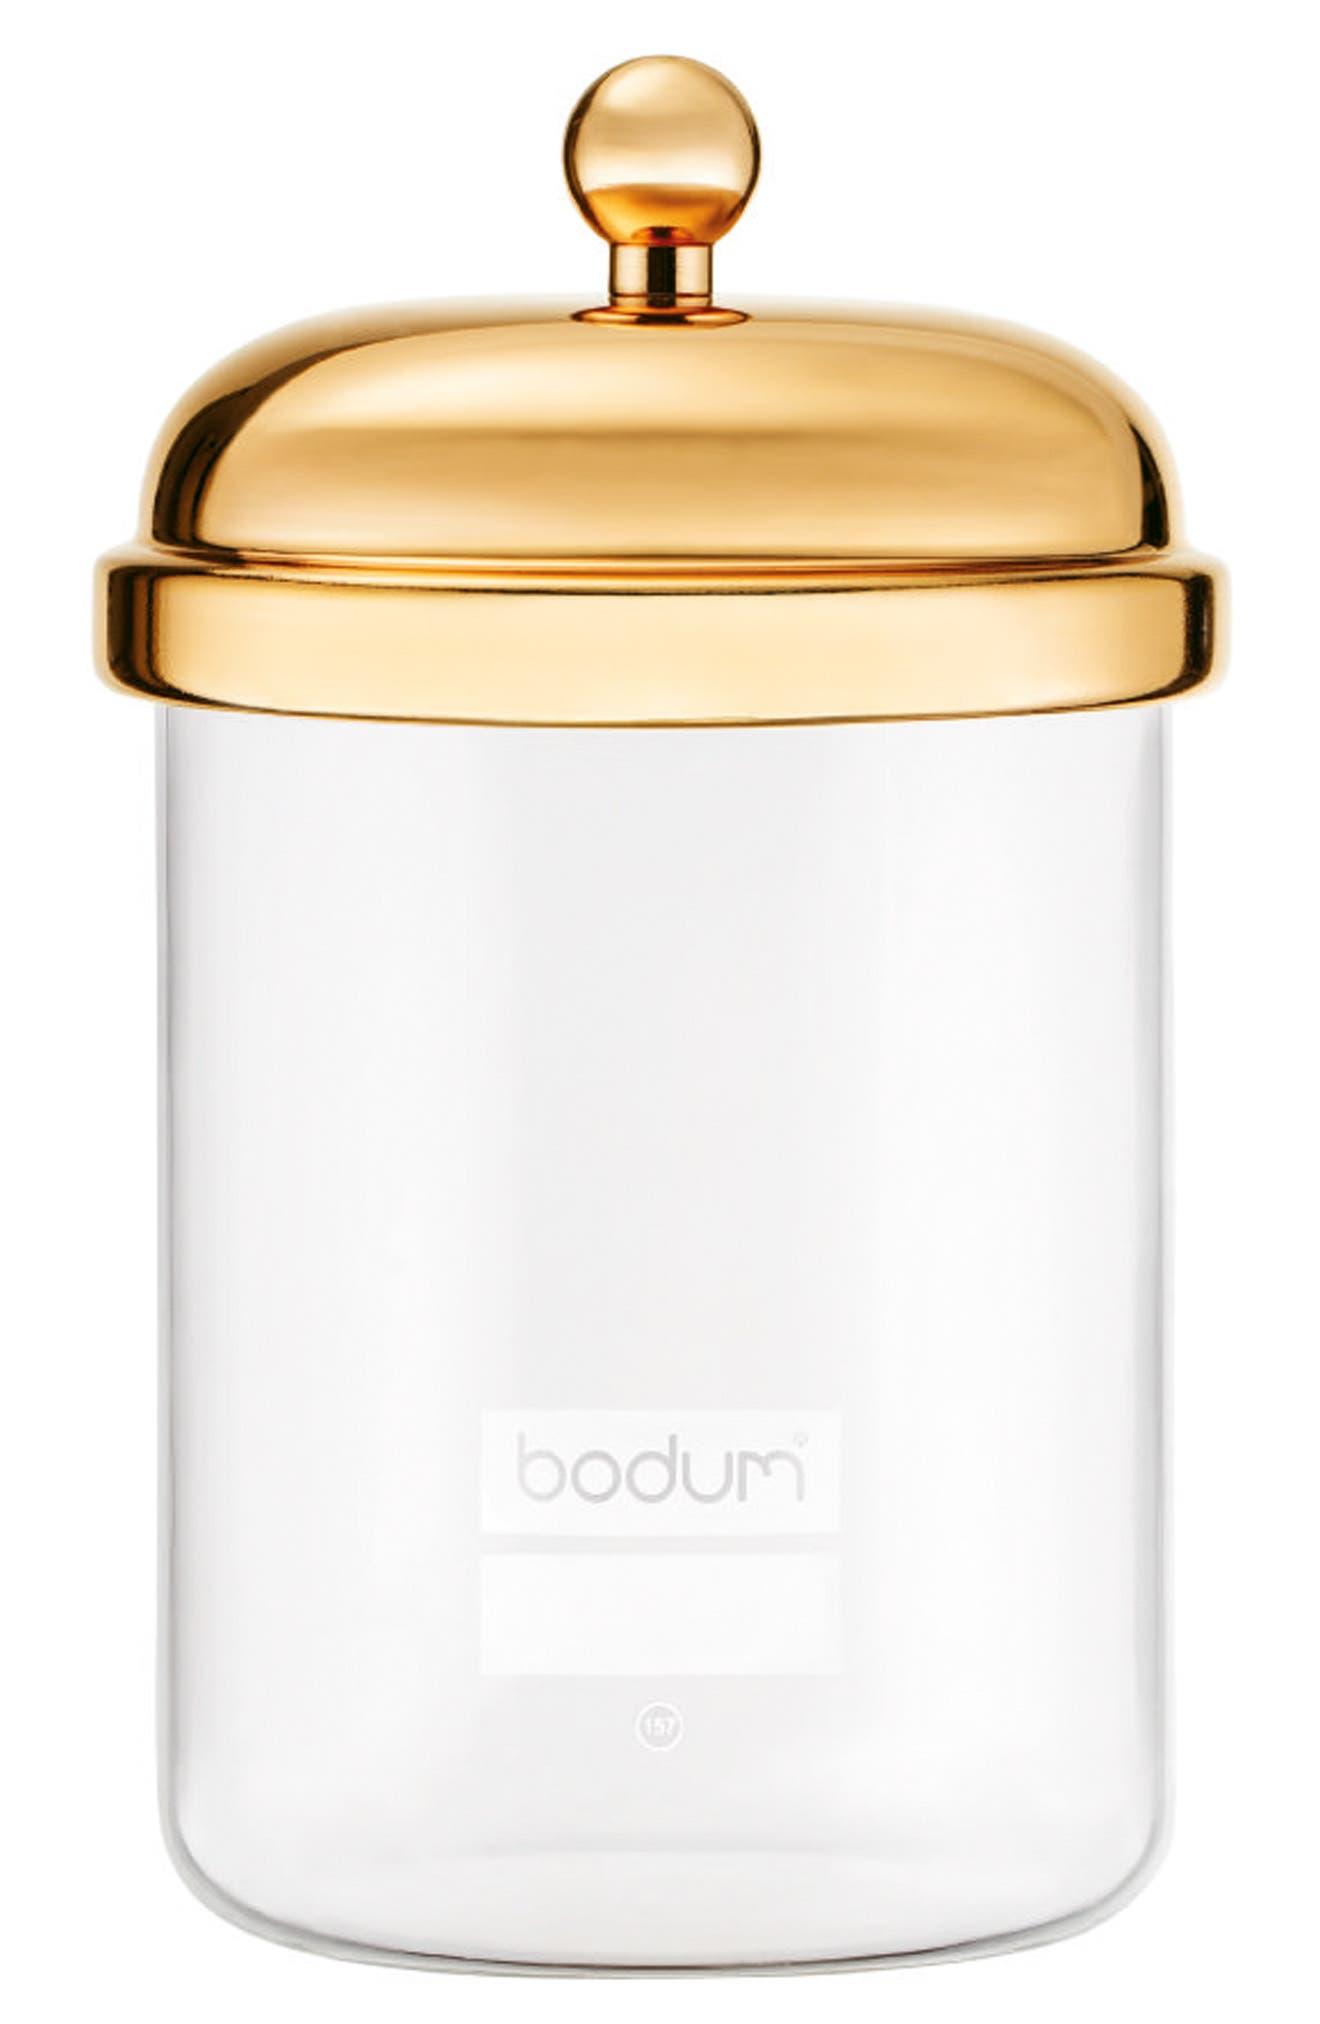 bodum Classic Storage Jar